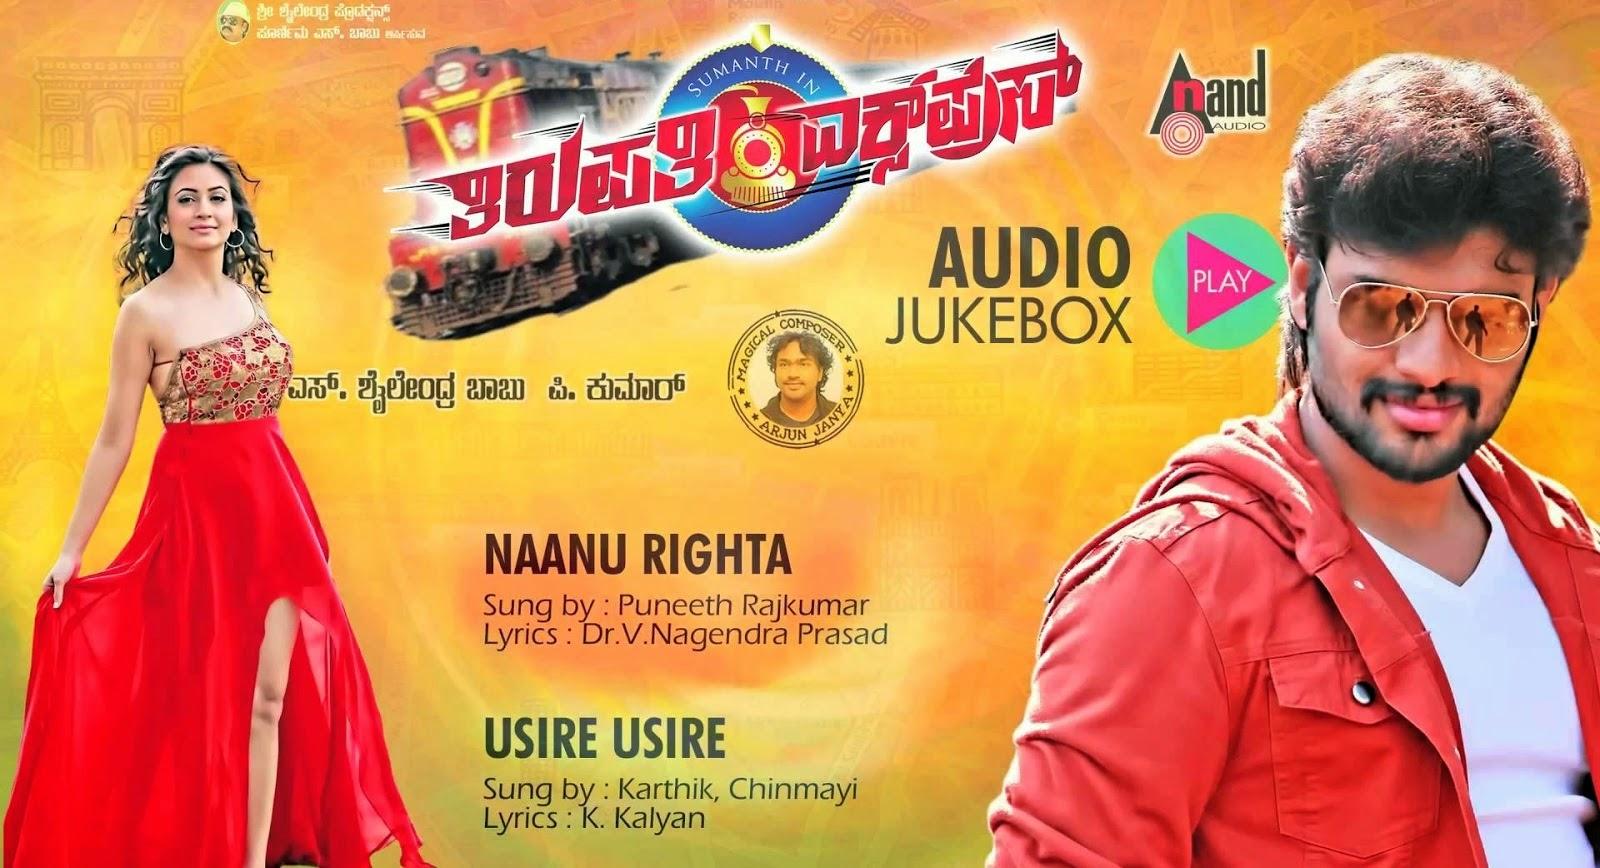 Thirupathi tamil movie download free.